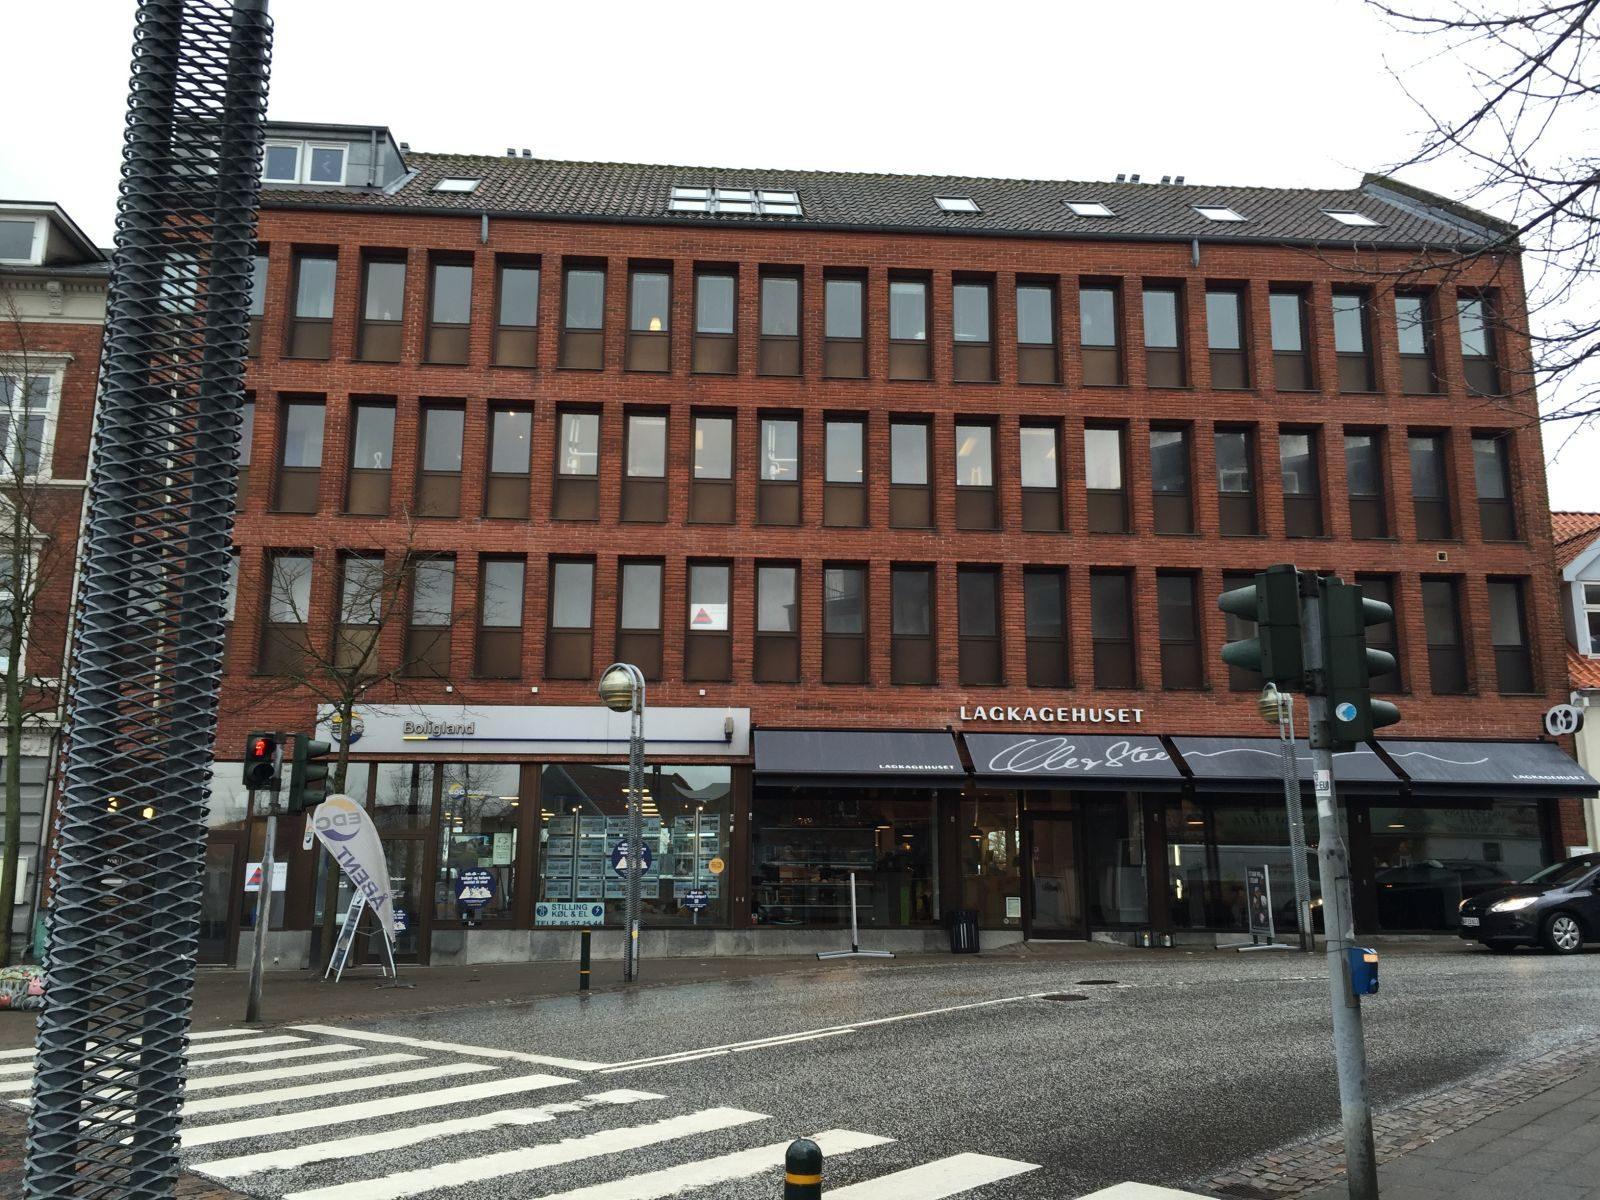 Adelgade 85A, 3. sal, Skanderborg